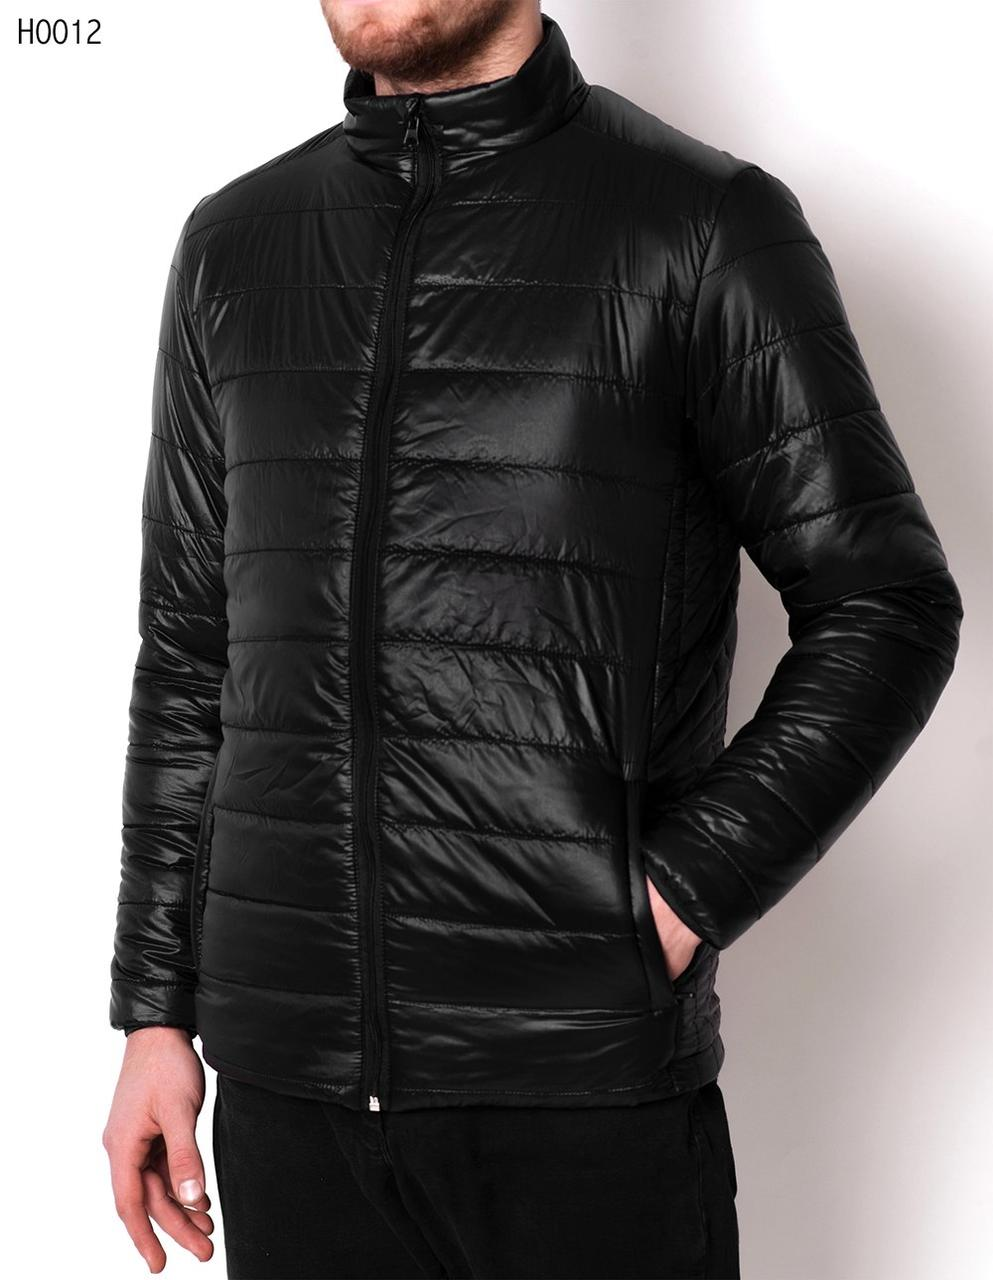 4c023d40240 Демисезонная мужская куртка Forest heat reflective Арт. H0012 -